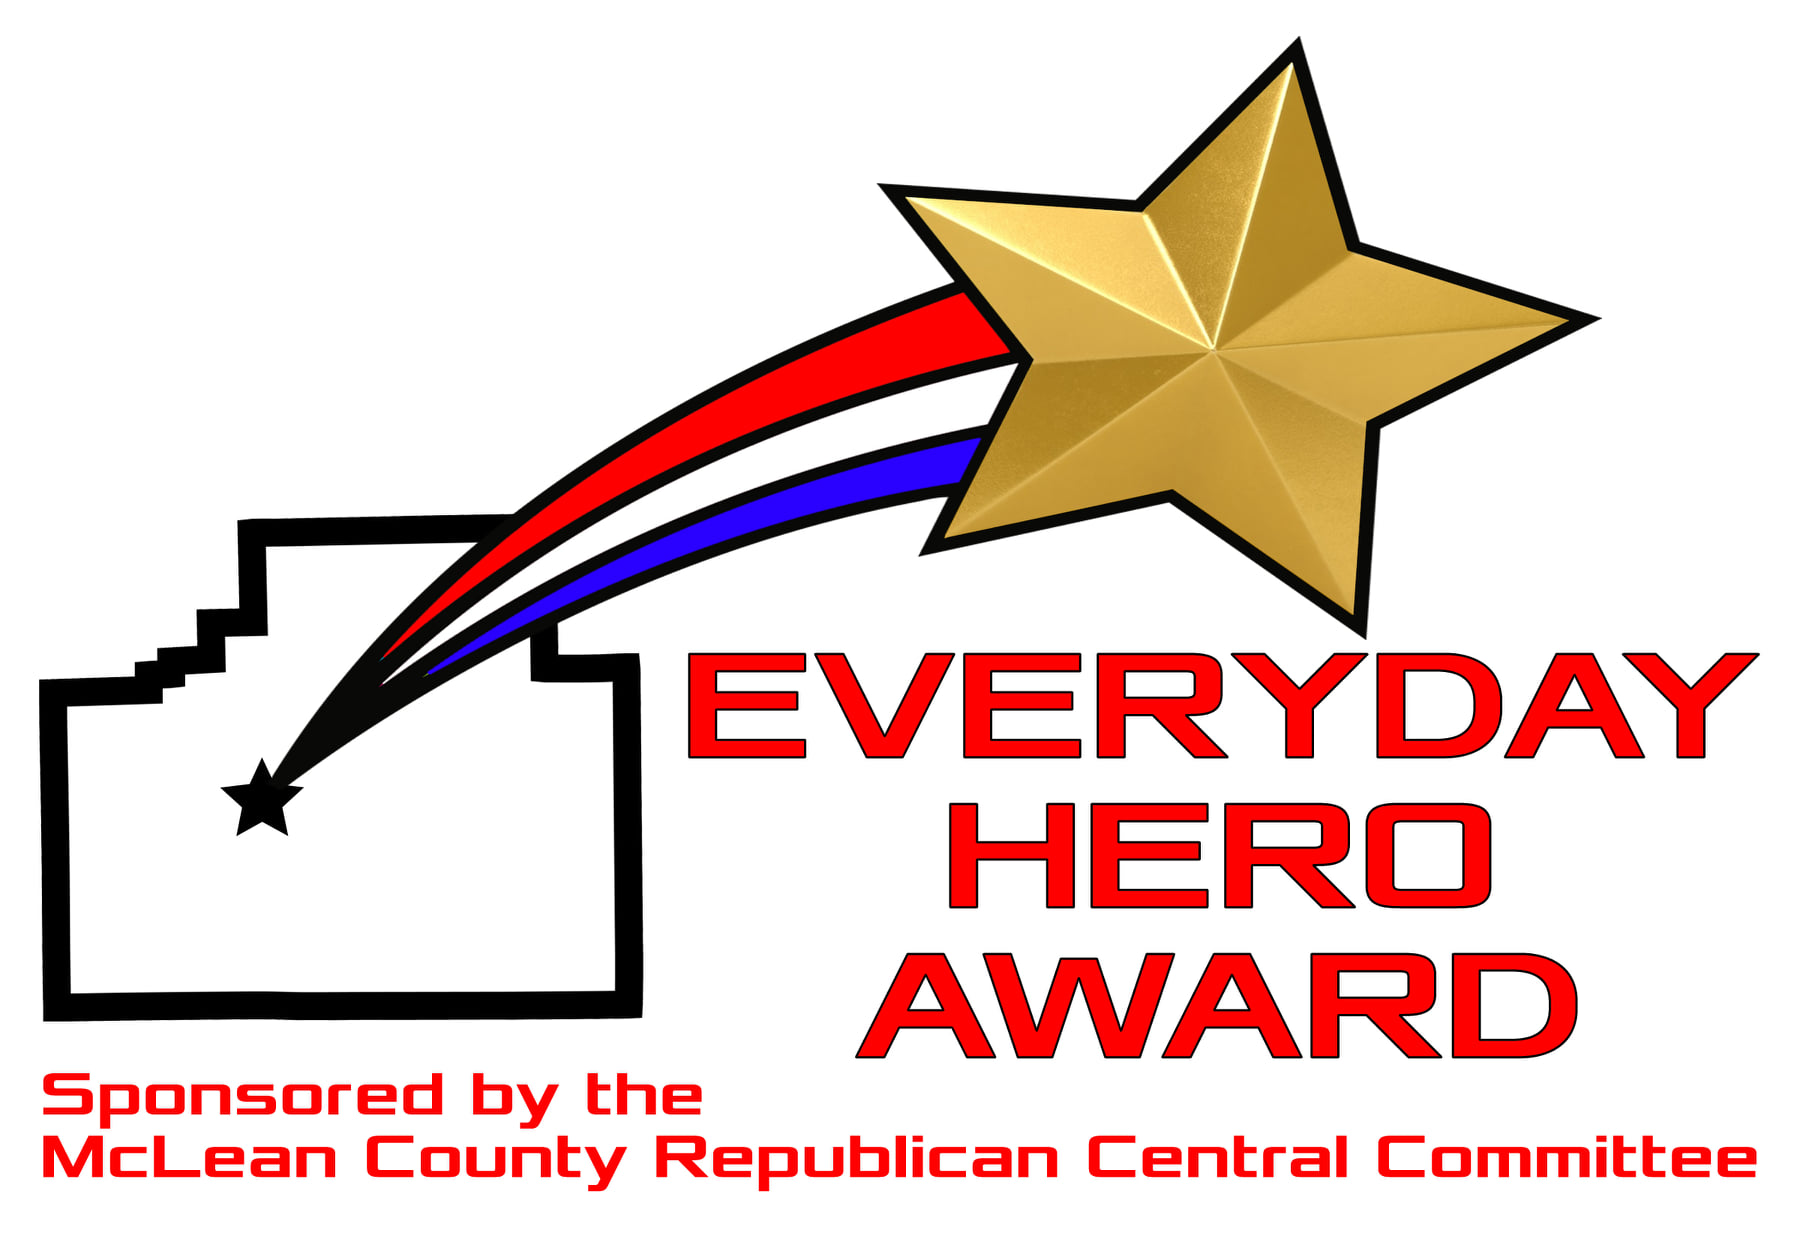 McLean County Republican Party names 2021 Everyday Hero Award winner